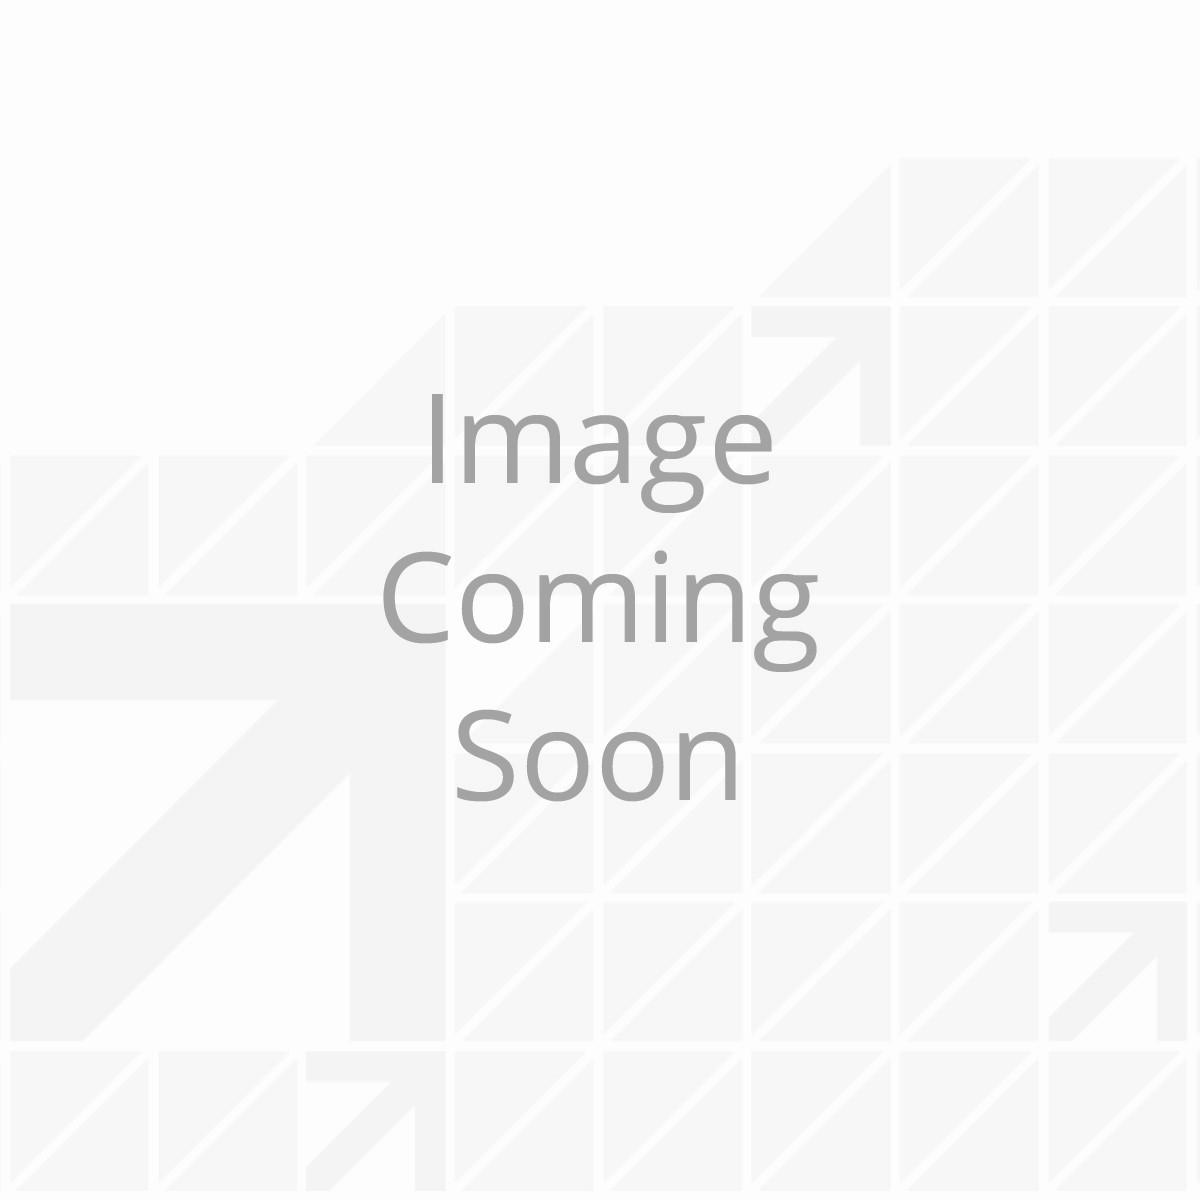 3 Room Manifold/Valve W/O Plate